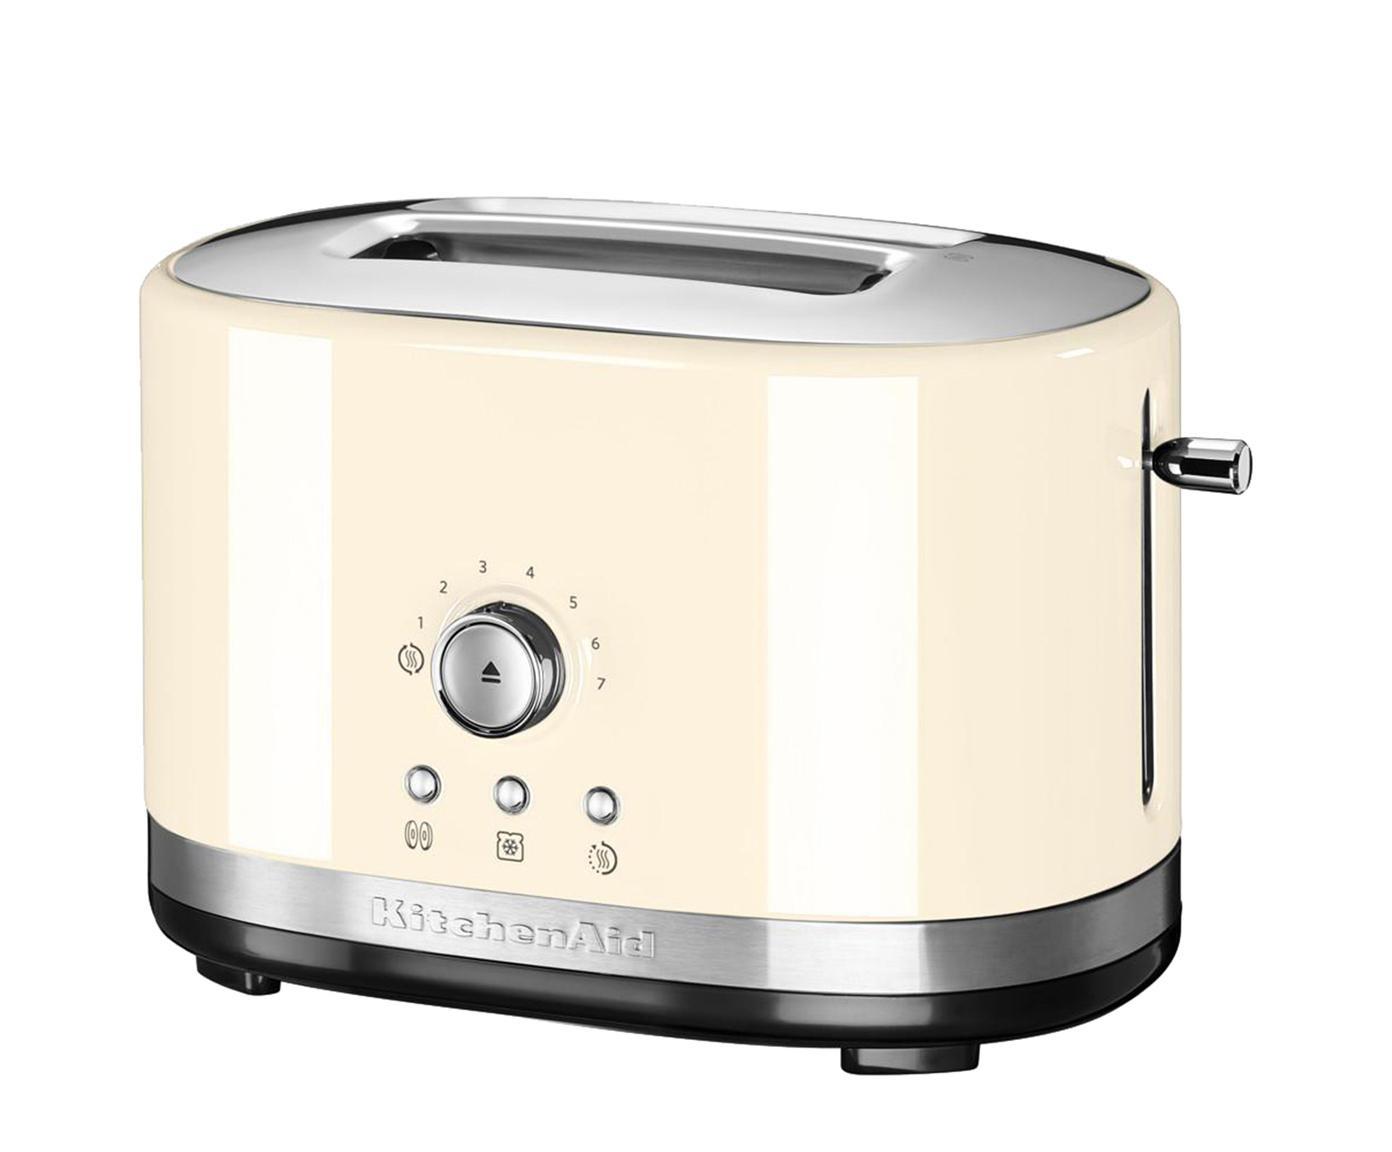 Toaster KitchenAid, Gehäuse: Aluminiumdruckguss, Edels, Cremefarben, 31 x 20 cm